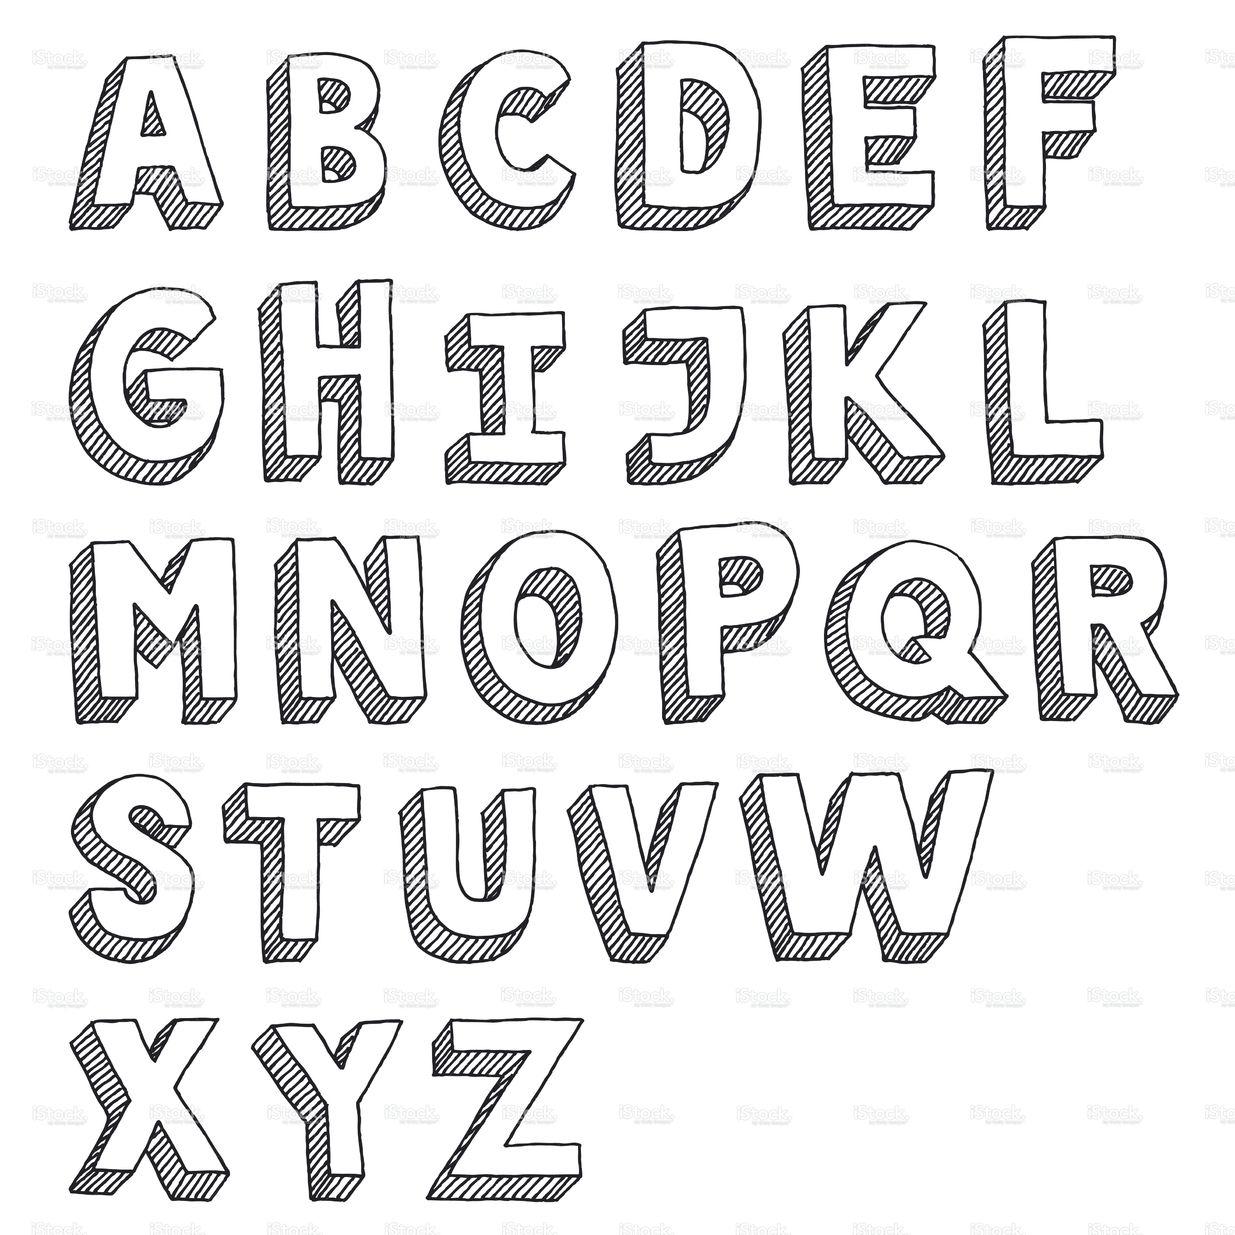 Hand-Drawn Vector Drawing Of An Sans Serif Alphabet -Capital